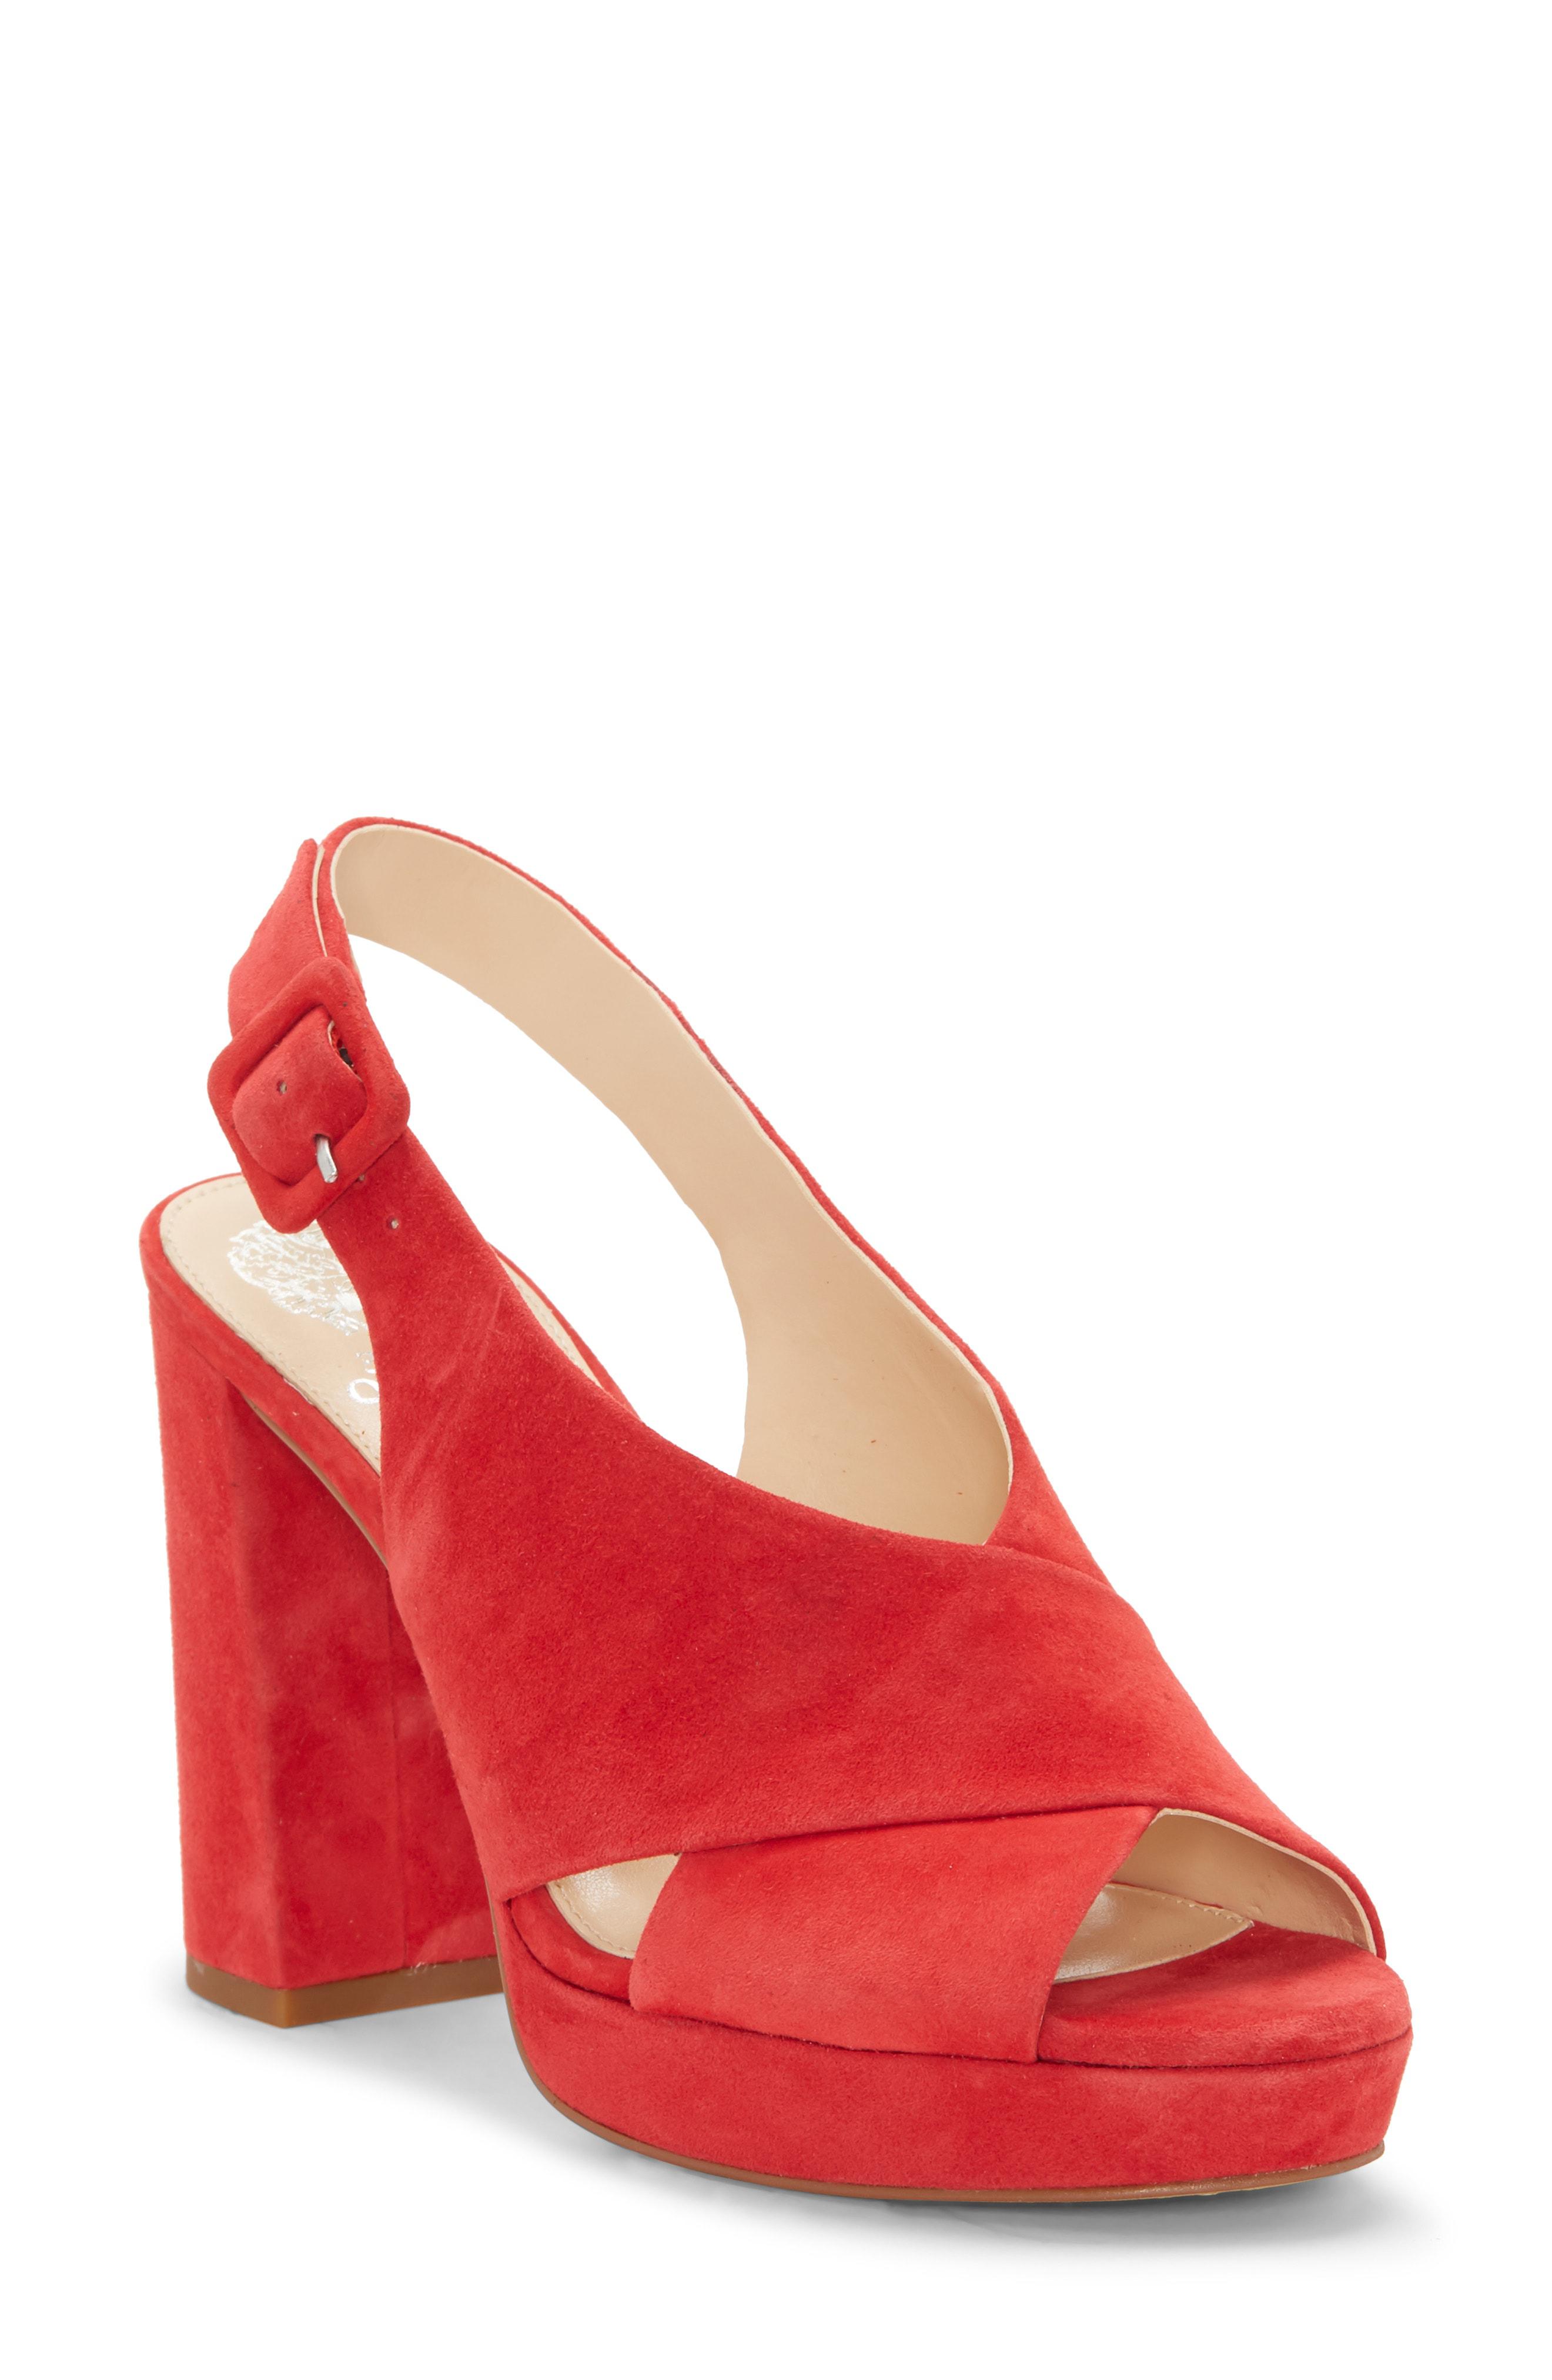 724483933b9 Vince Camuto Slingback Platform Sandal In Glamour Red Suede